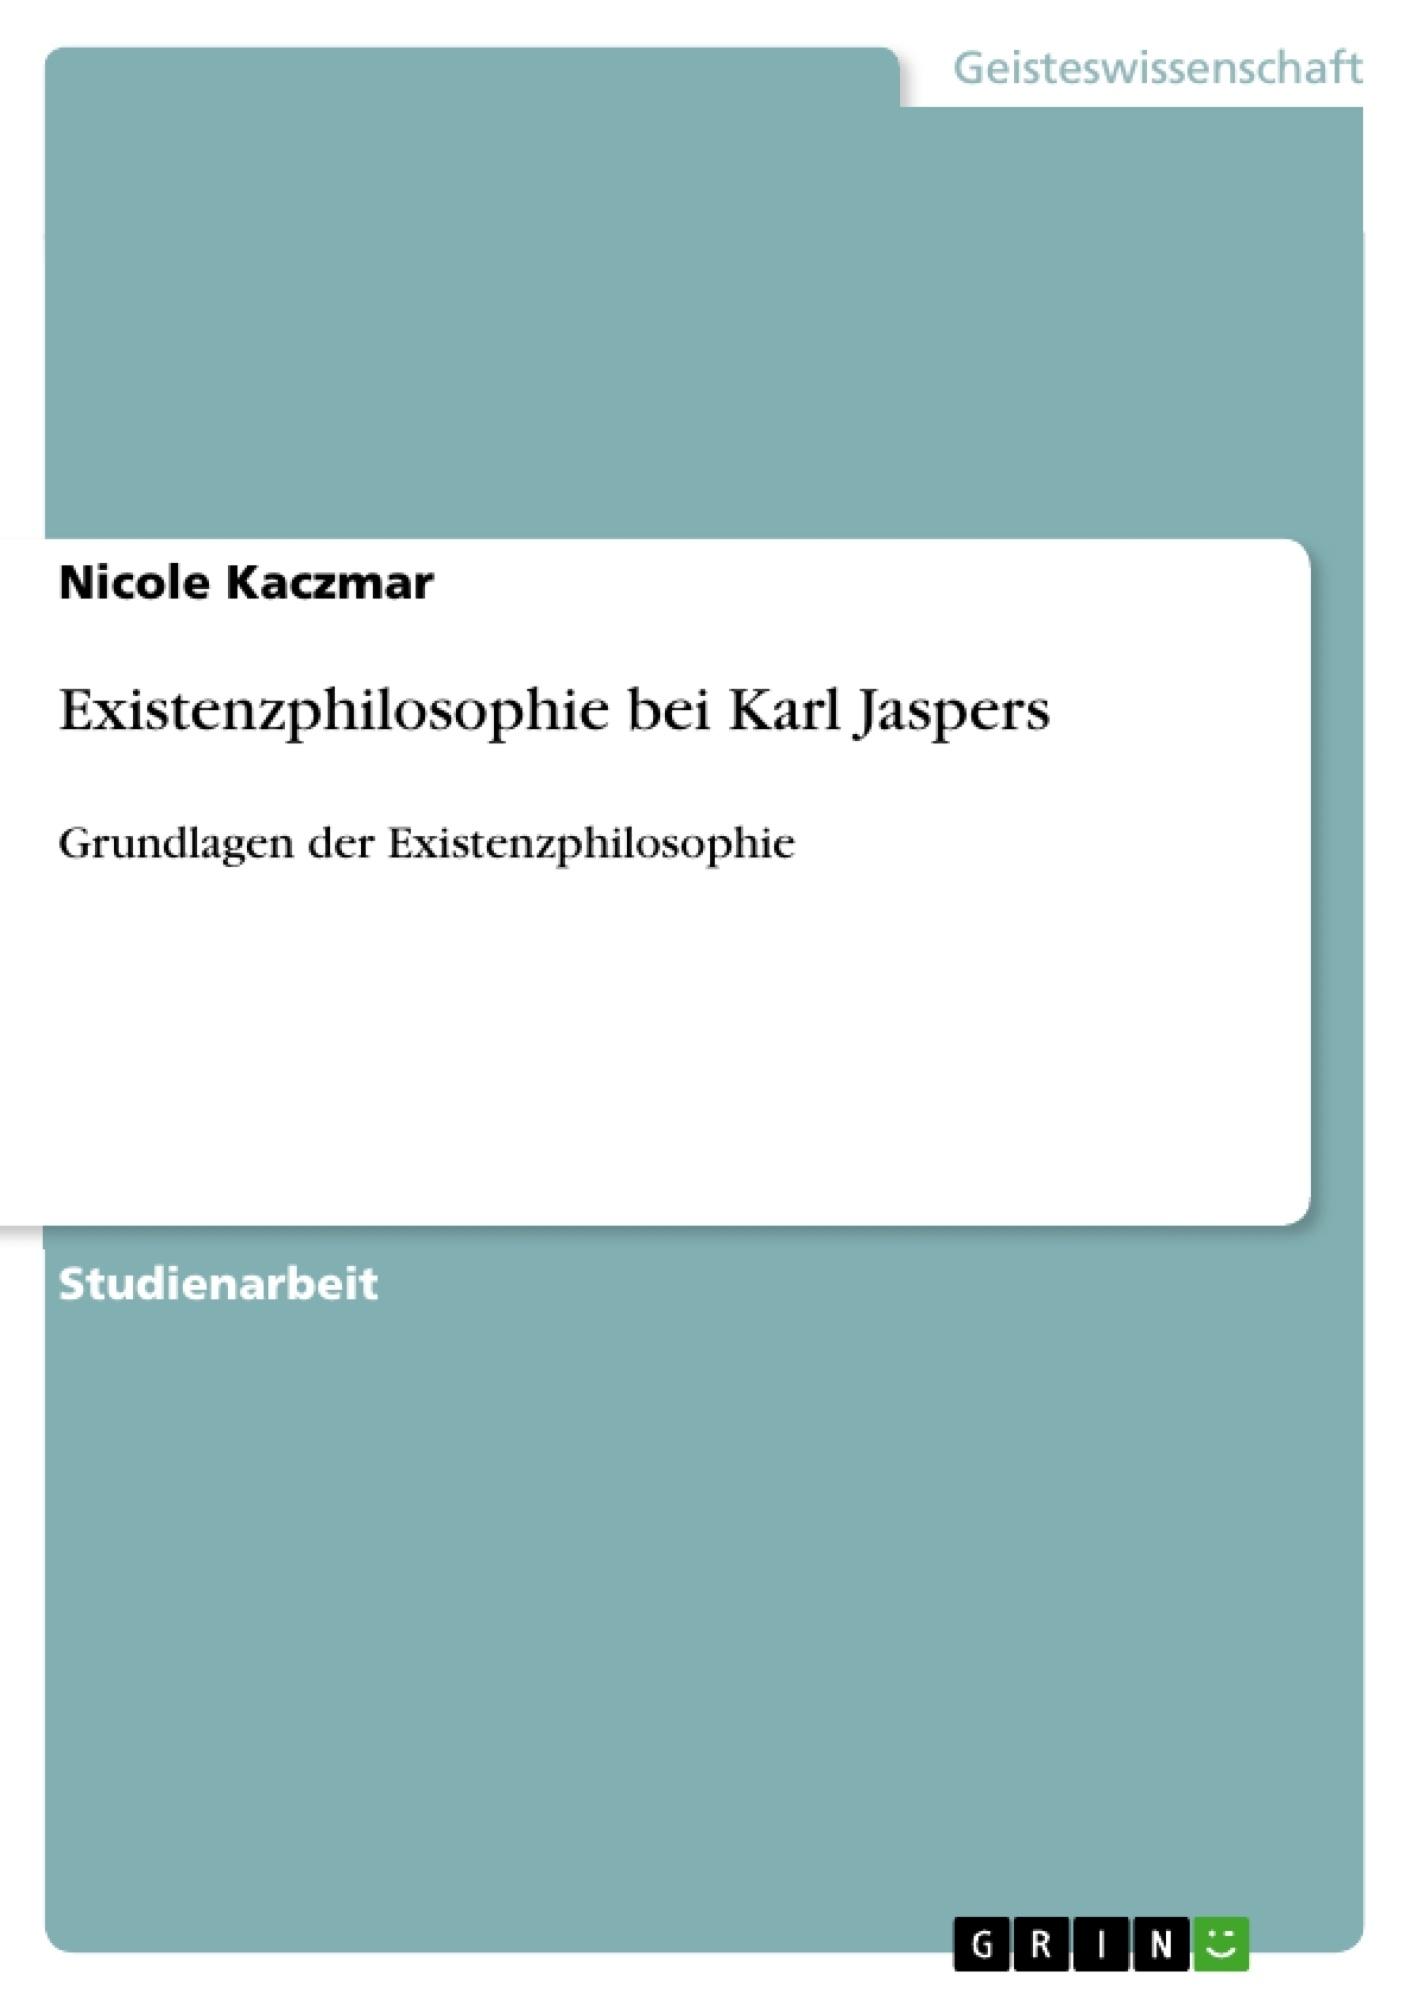 Titel: Existenzphilosophie bei Karl Jaspers